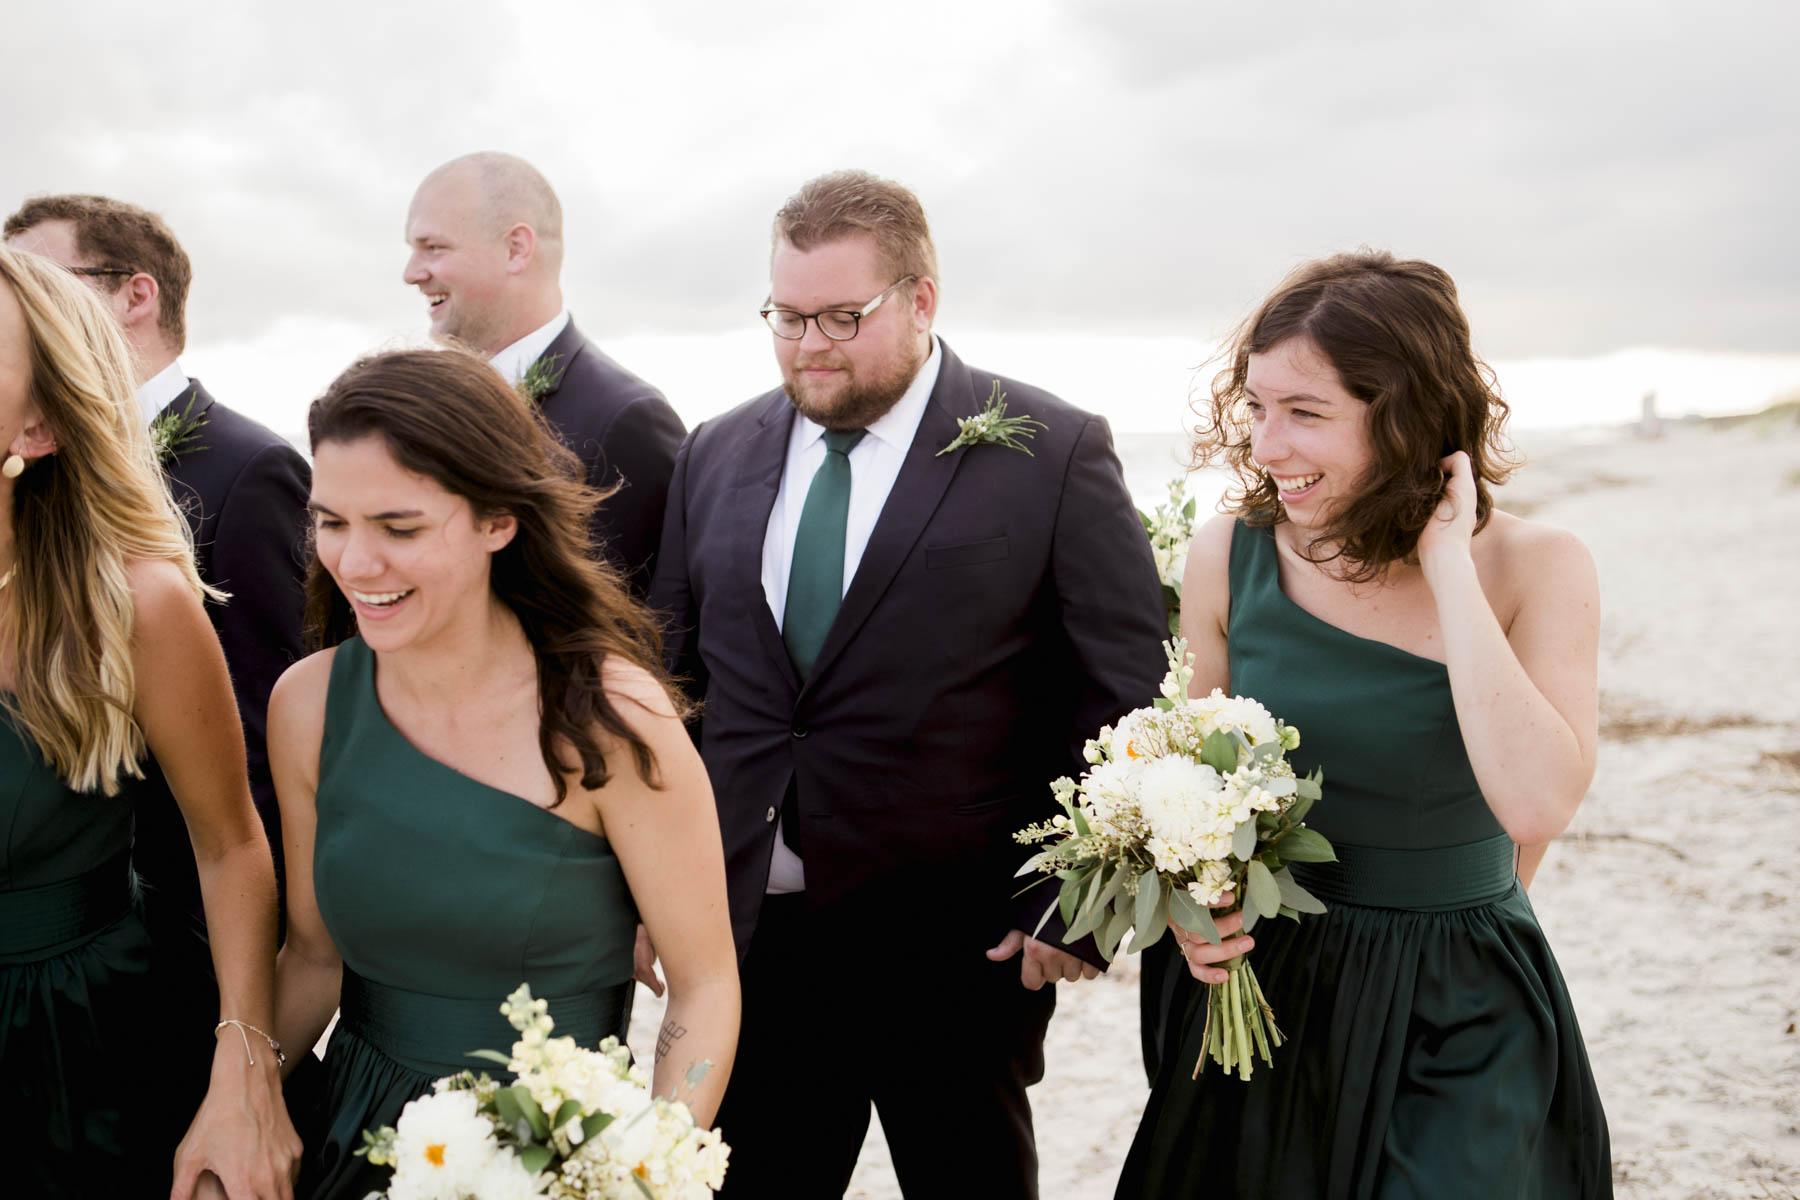 shotbychelsea_wedding_blog-38.jpg